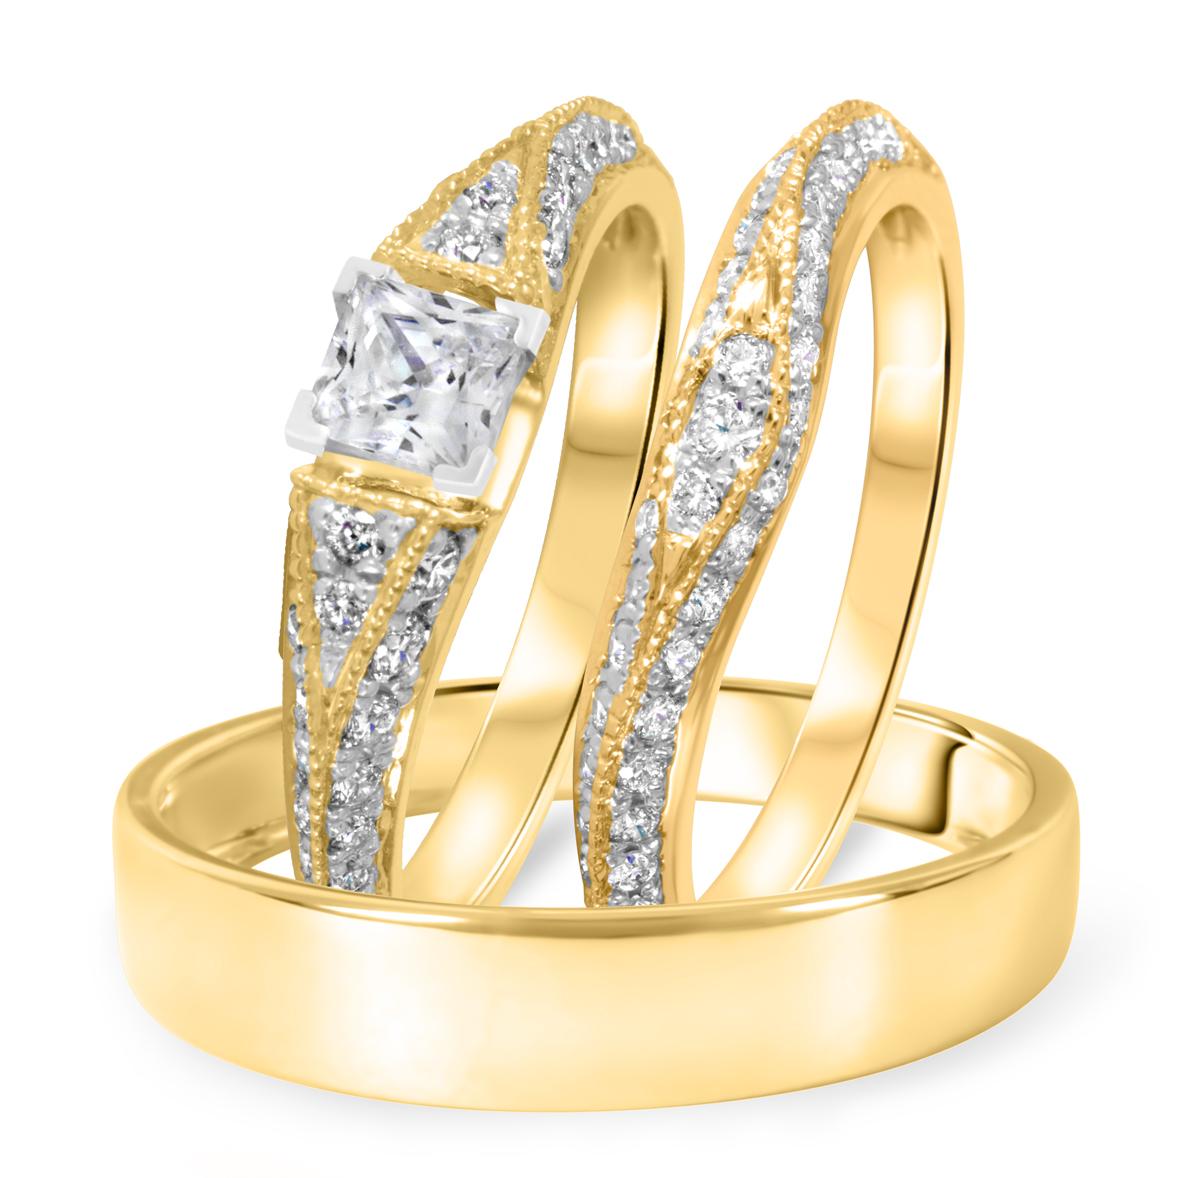 1 1/6 CT. T.W. Diamond Ladies Engagement Ring, Wedding Band, Men's Wedding Band